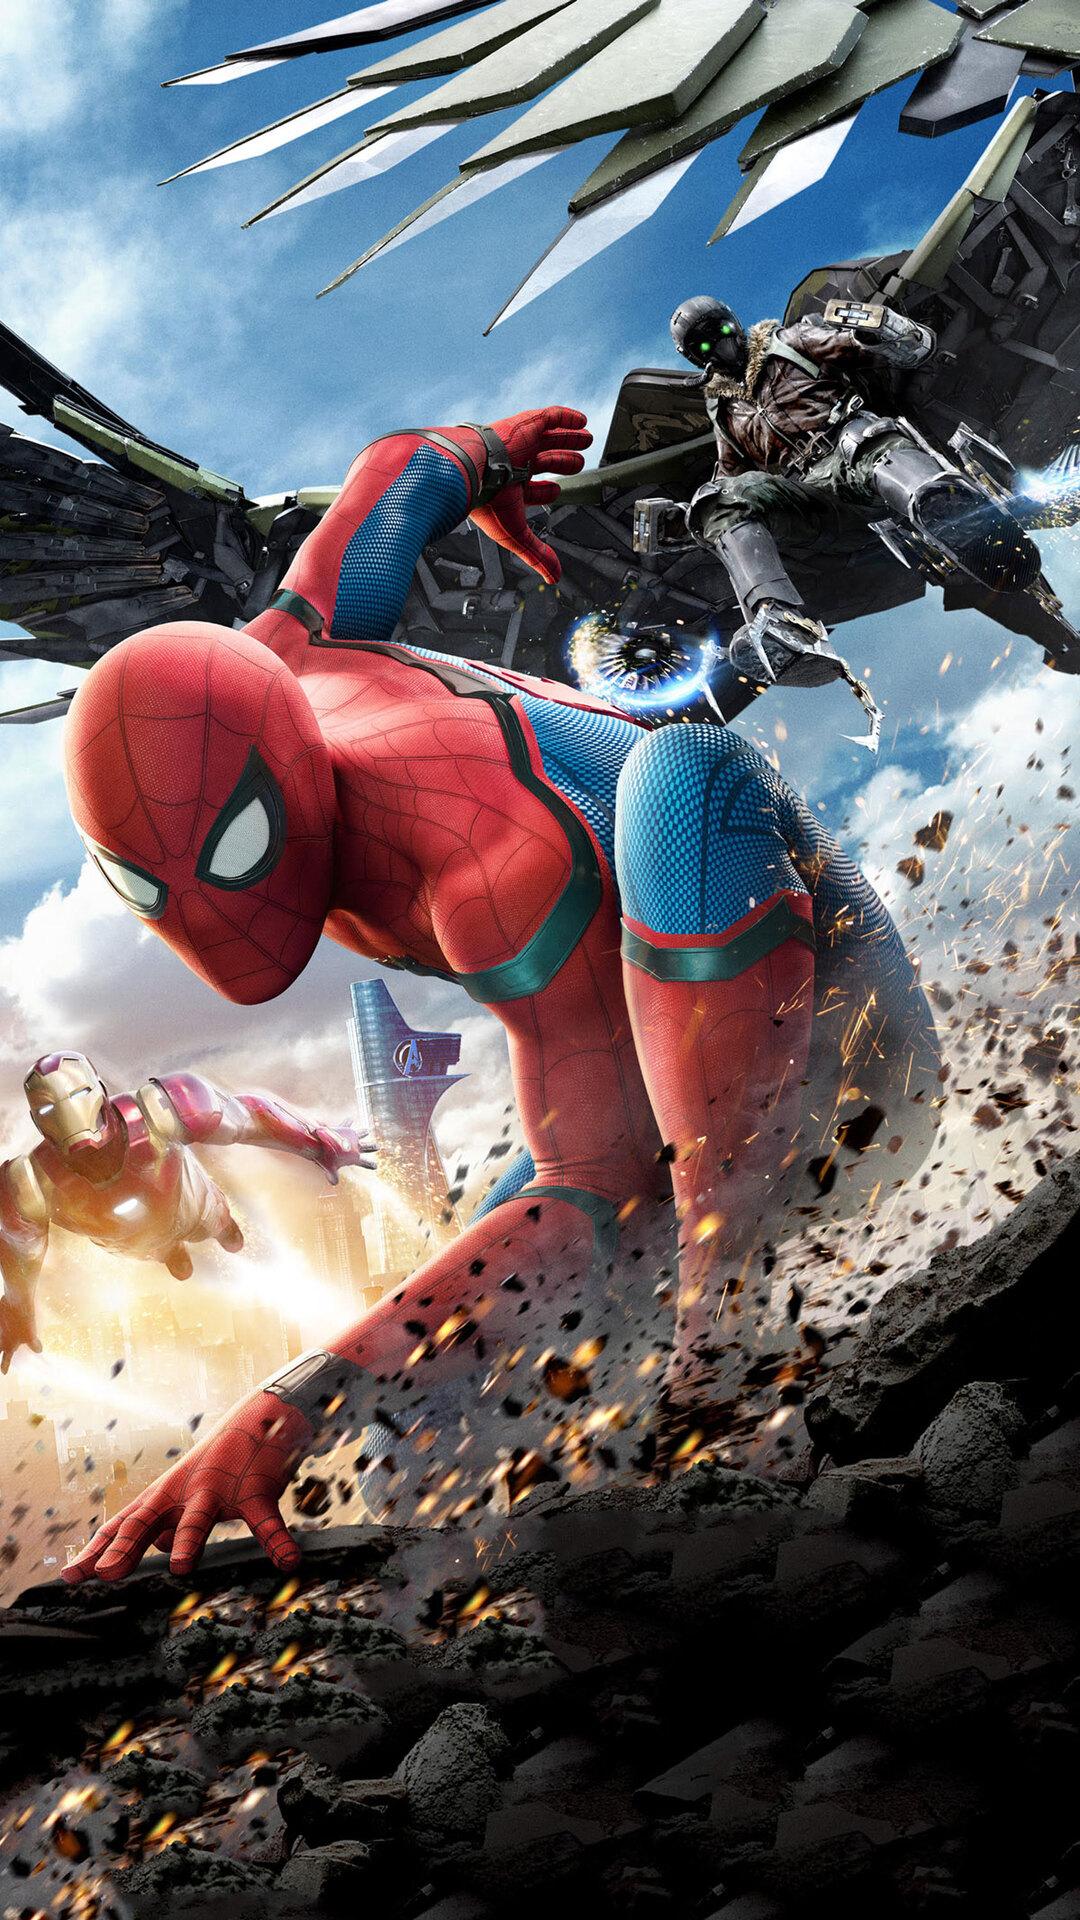 spiderman-homecoming-2017-movie-qj.jpg